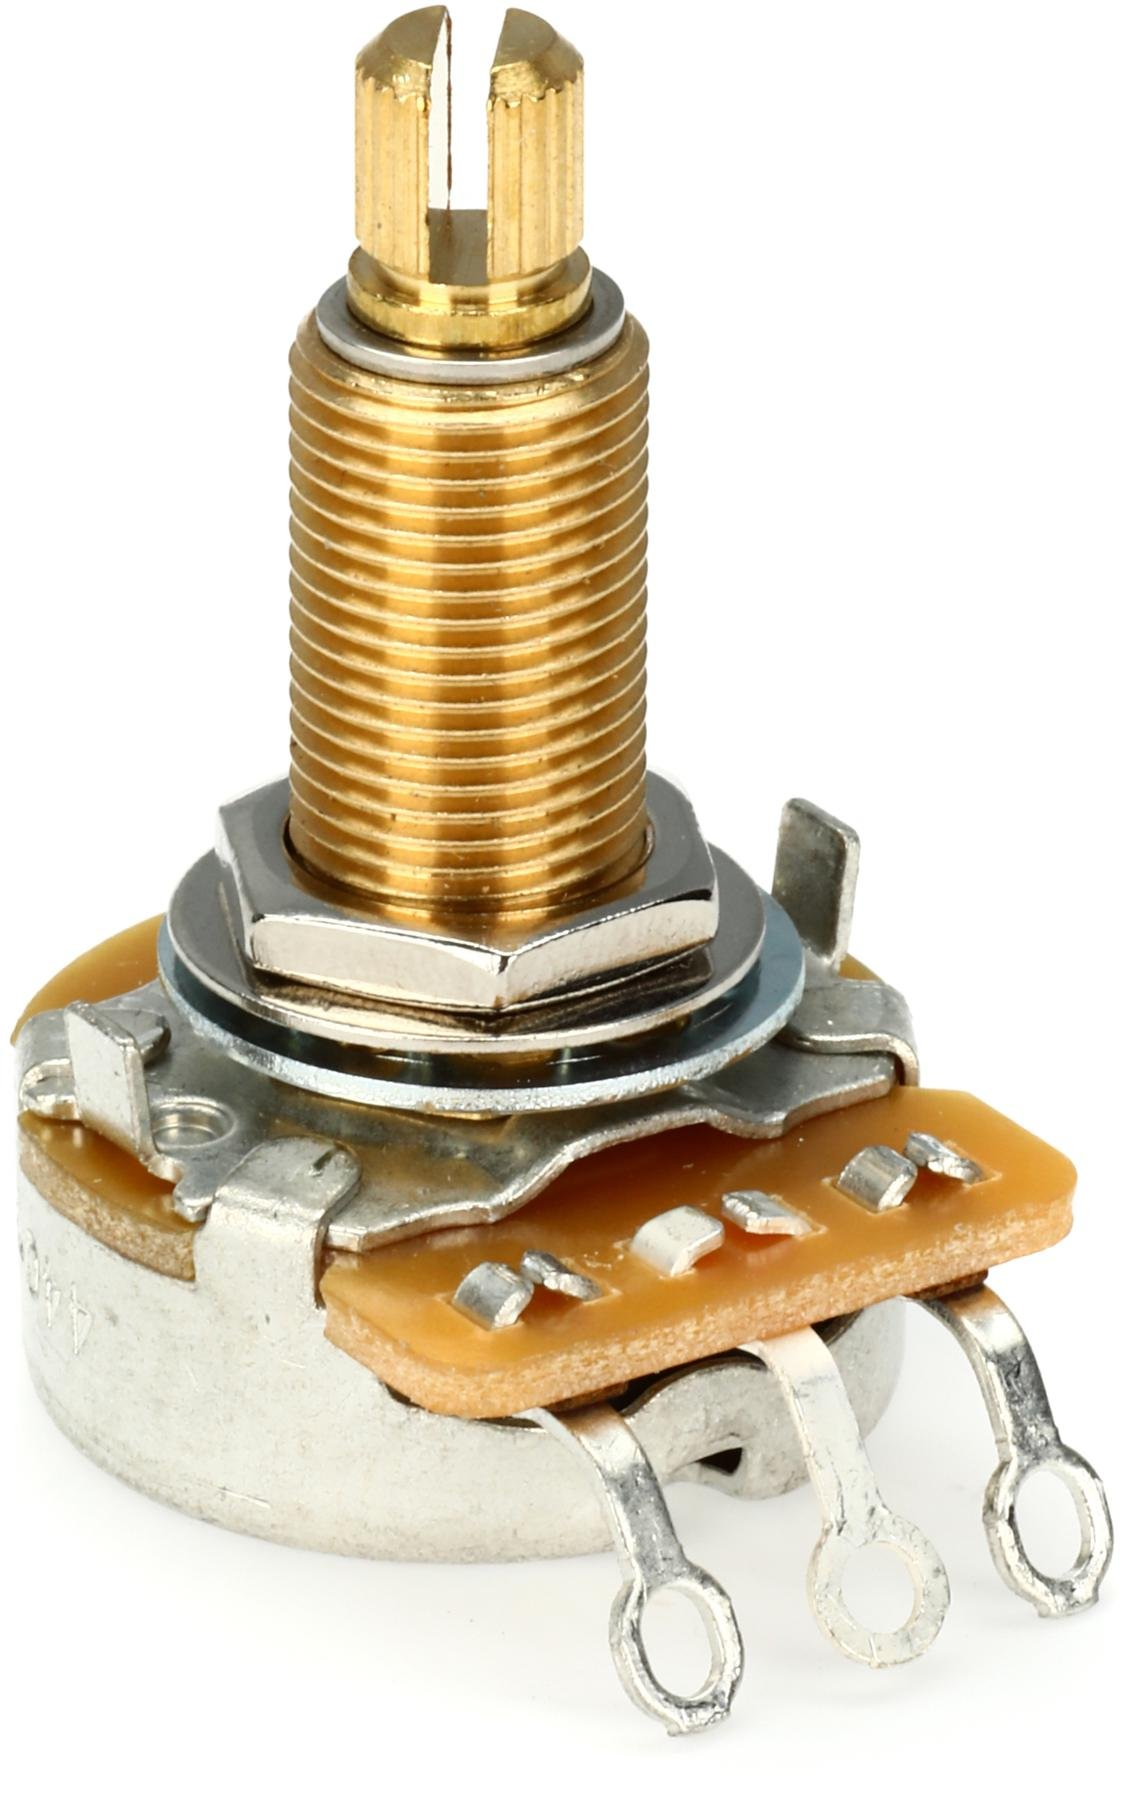 24mm Wide 2pcs Single Turn 3//8 Hole Mount 1//4 Diameter 1.5 Long Shaft 500 Ohm Potentiometer Linear Taper Pot